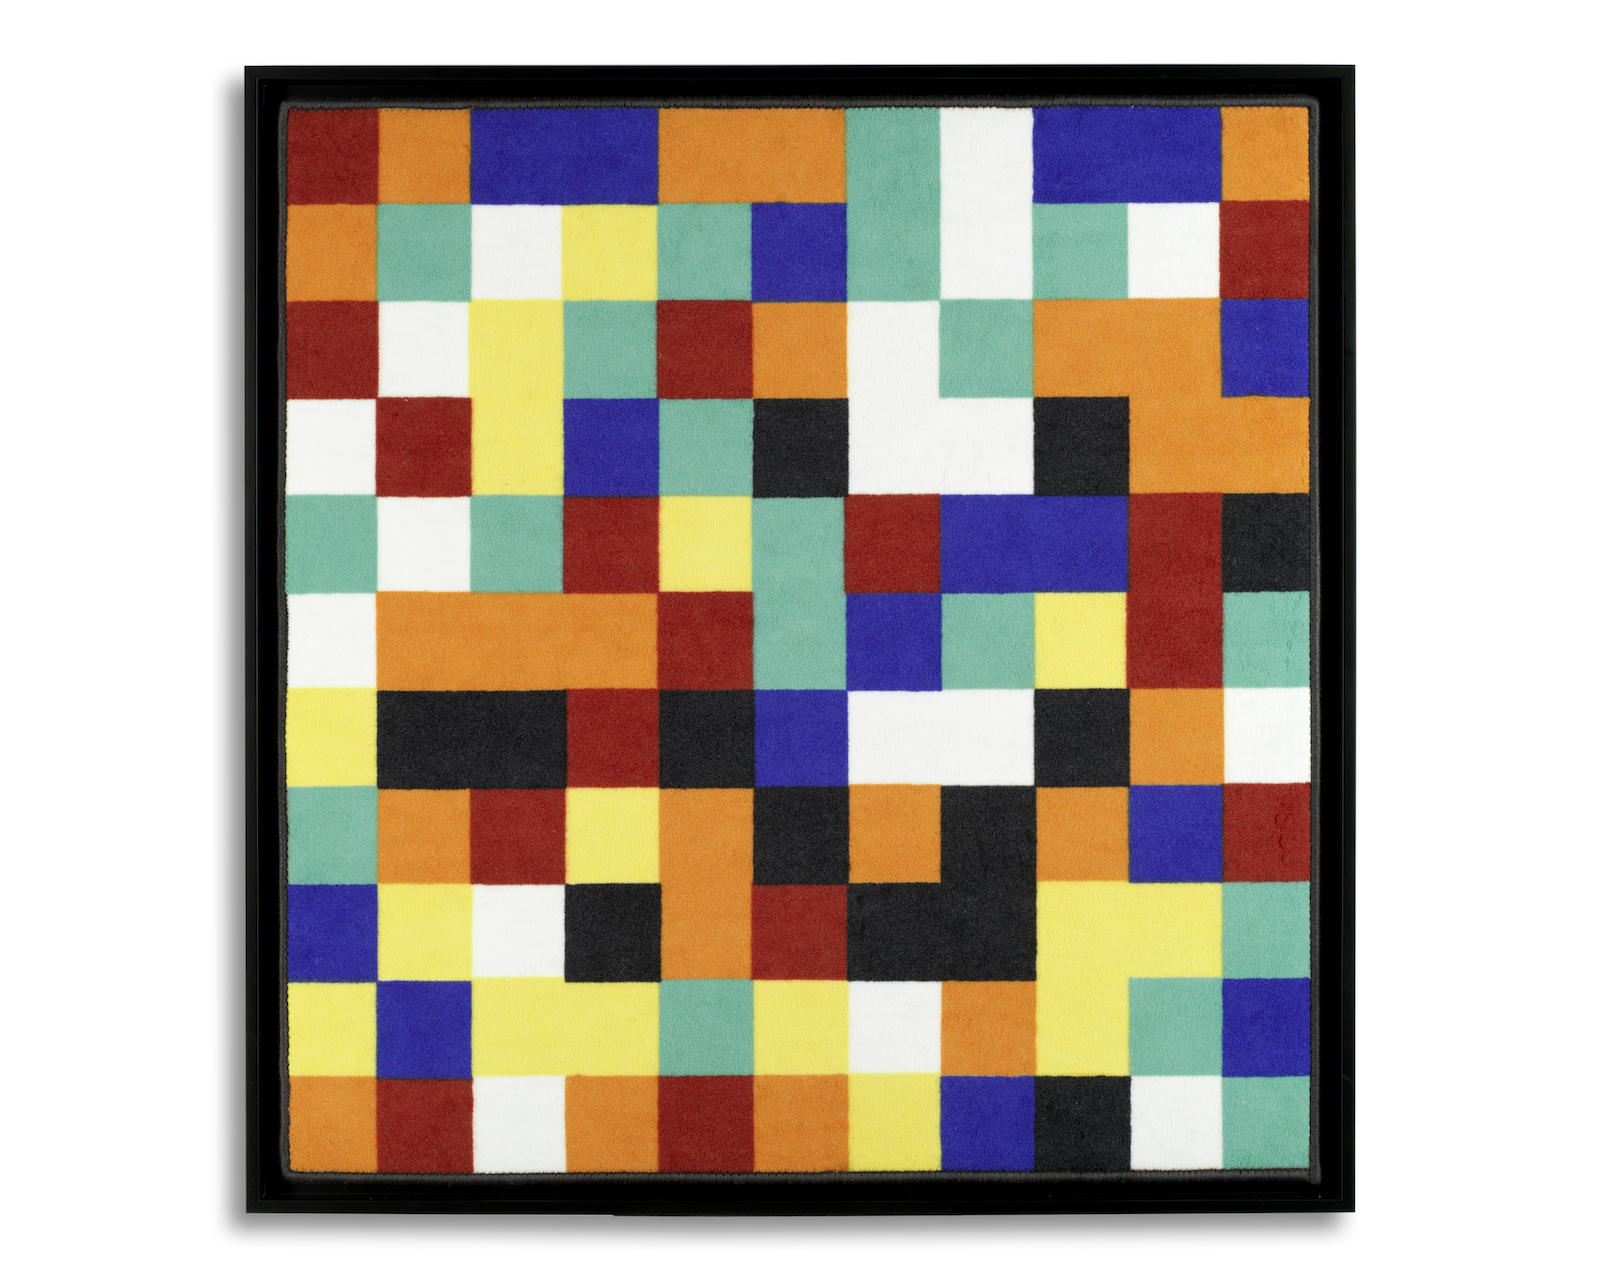 Gerhard Richter-After Gerhard Richter - 1024 Colours-1988